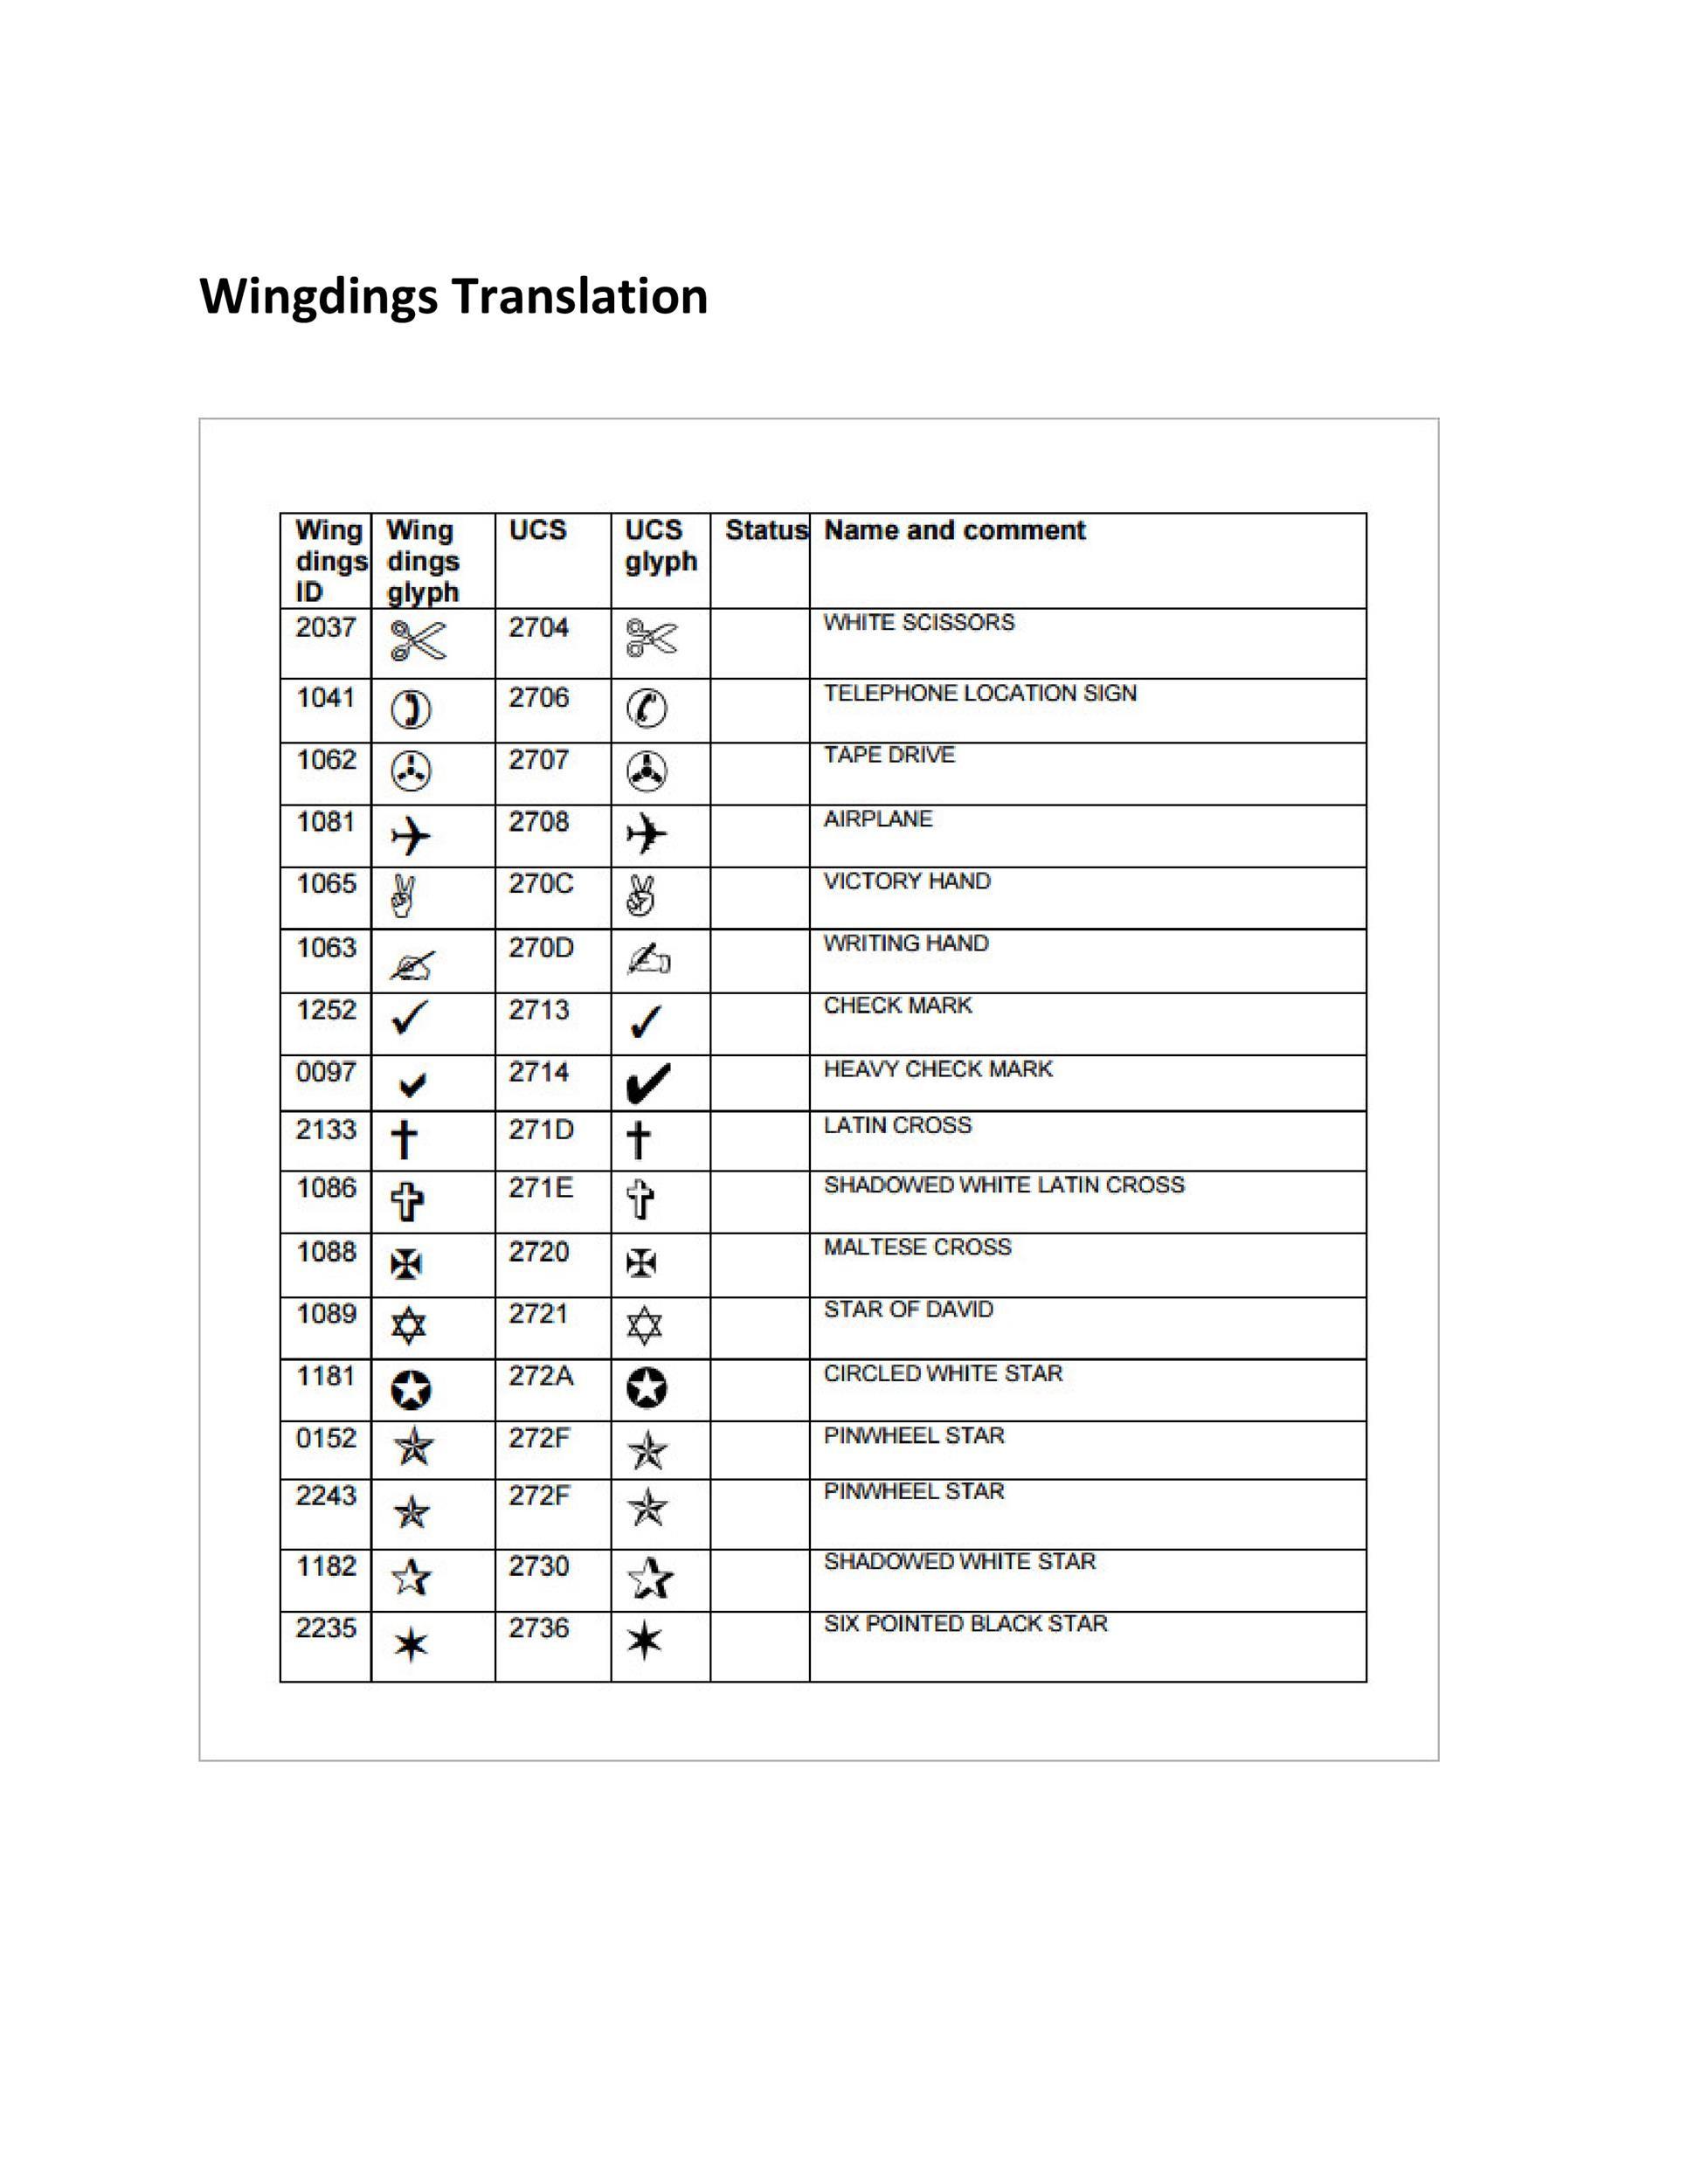 Free wingdings translator template 15